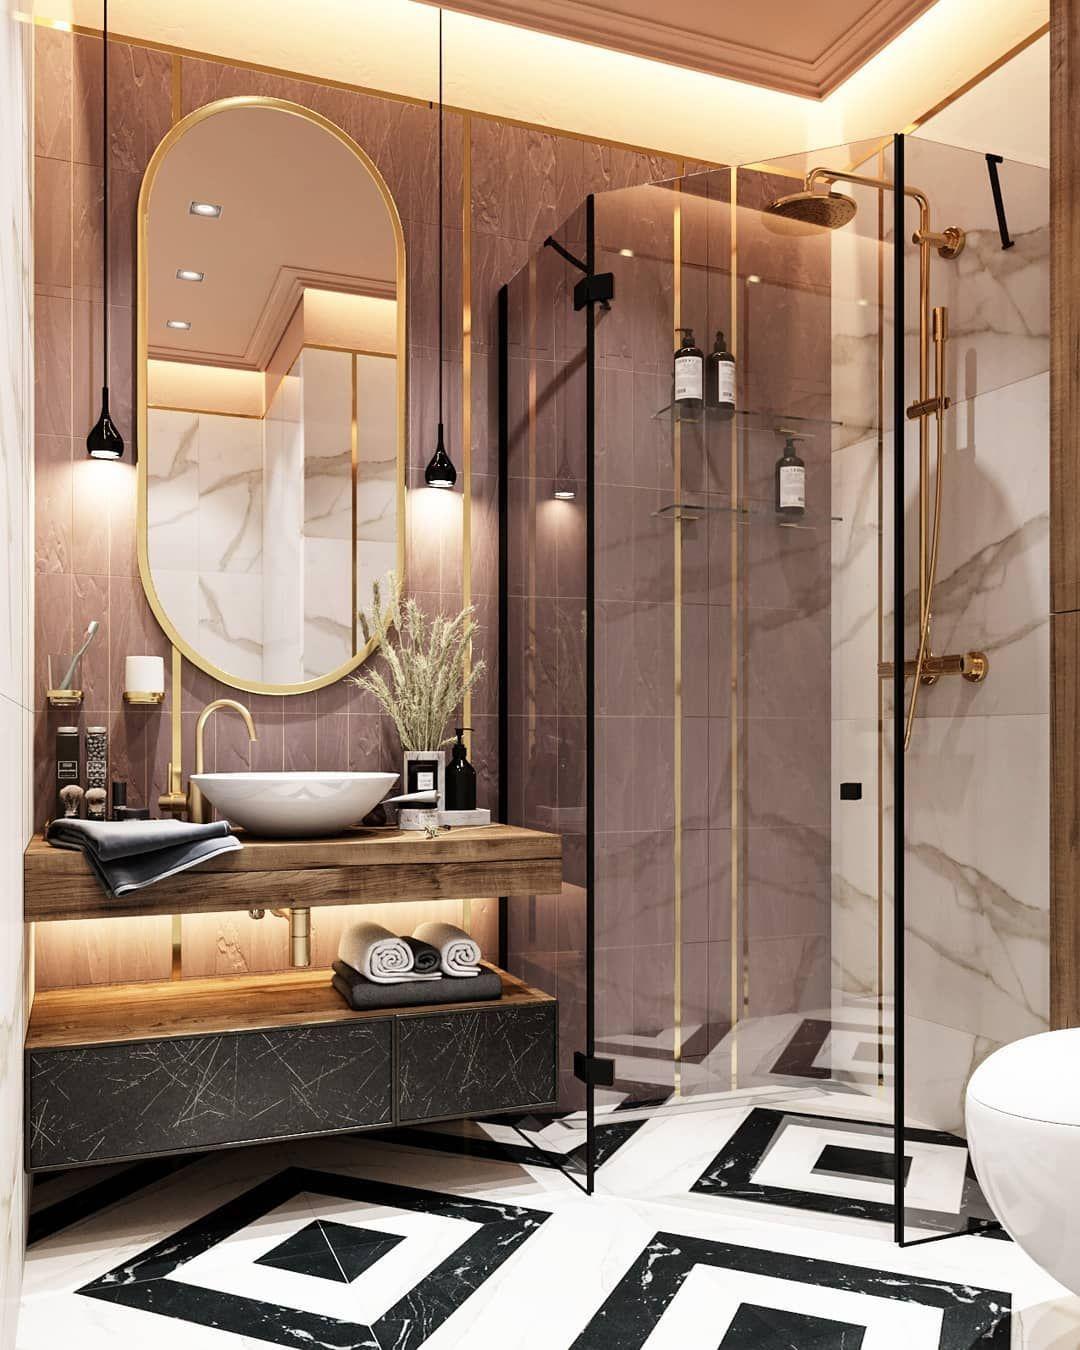 Studiya Dizajna Dd Designdd On Instagram Bogatyj I Sochnyj Sanuzel V Zhk Vavilove Pl In 2020 Bathroom Design Decor Bathroom Interior Design Bathroom Design Luxury